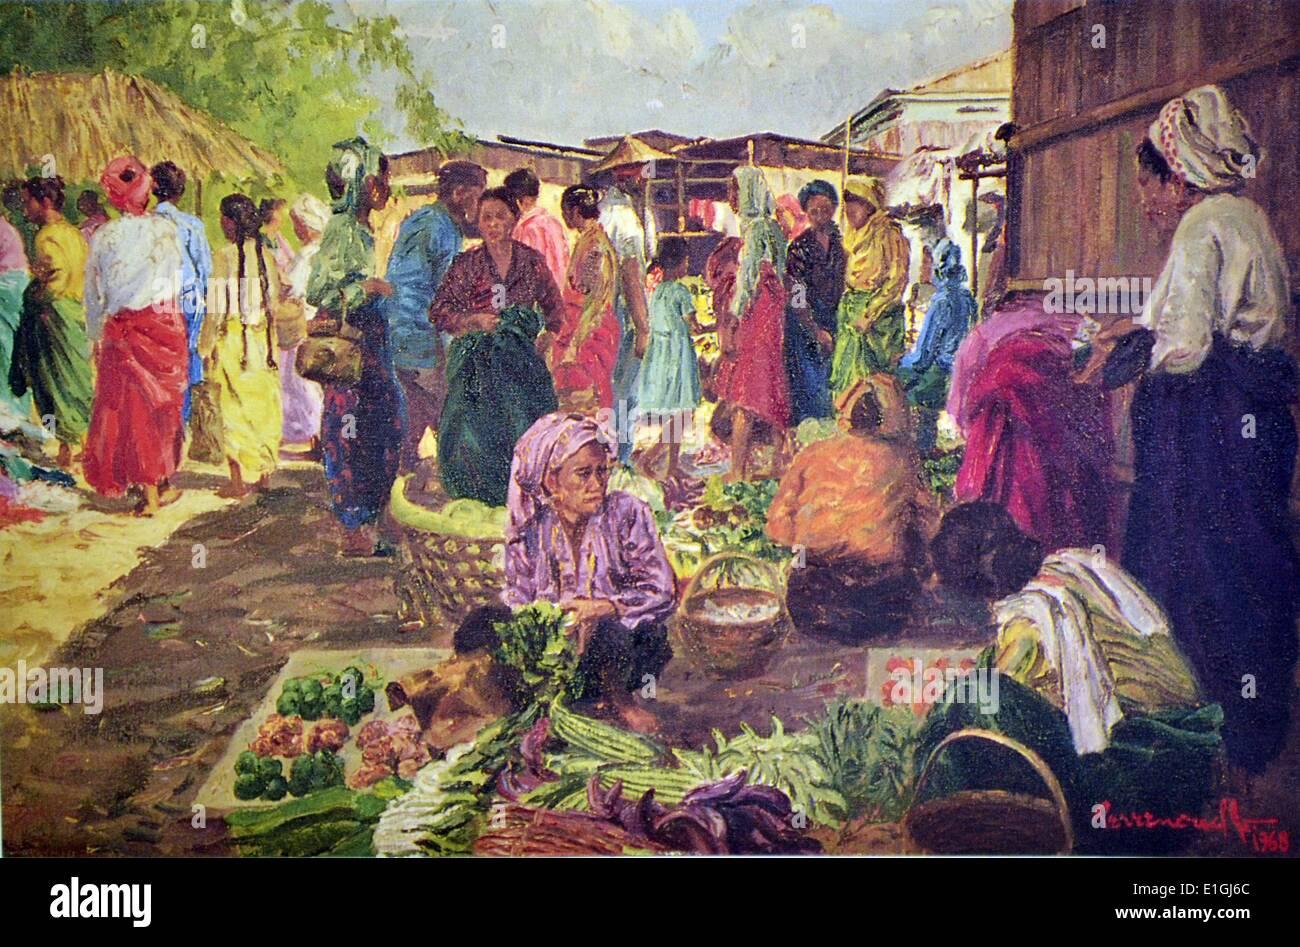 Eduardo Gonzales Perrenoud, Jr., Mga Labandera sa Ilog, 1967, Oil on canvas. - Stock Image